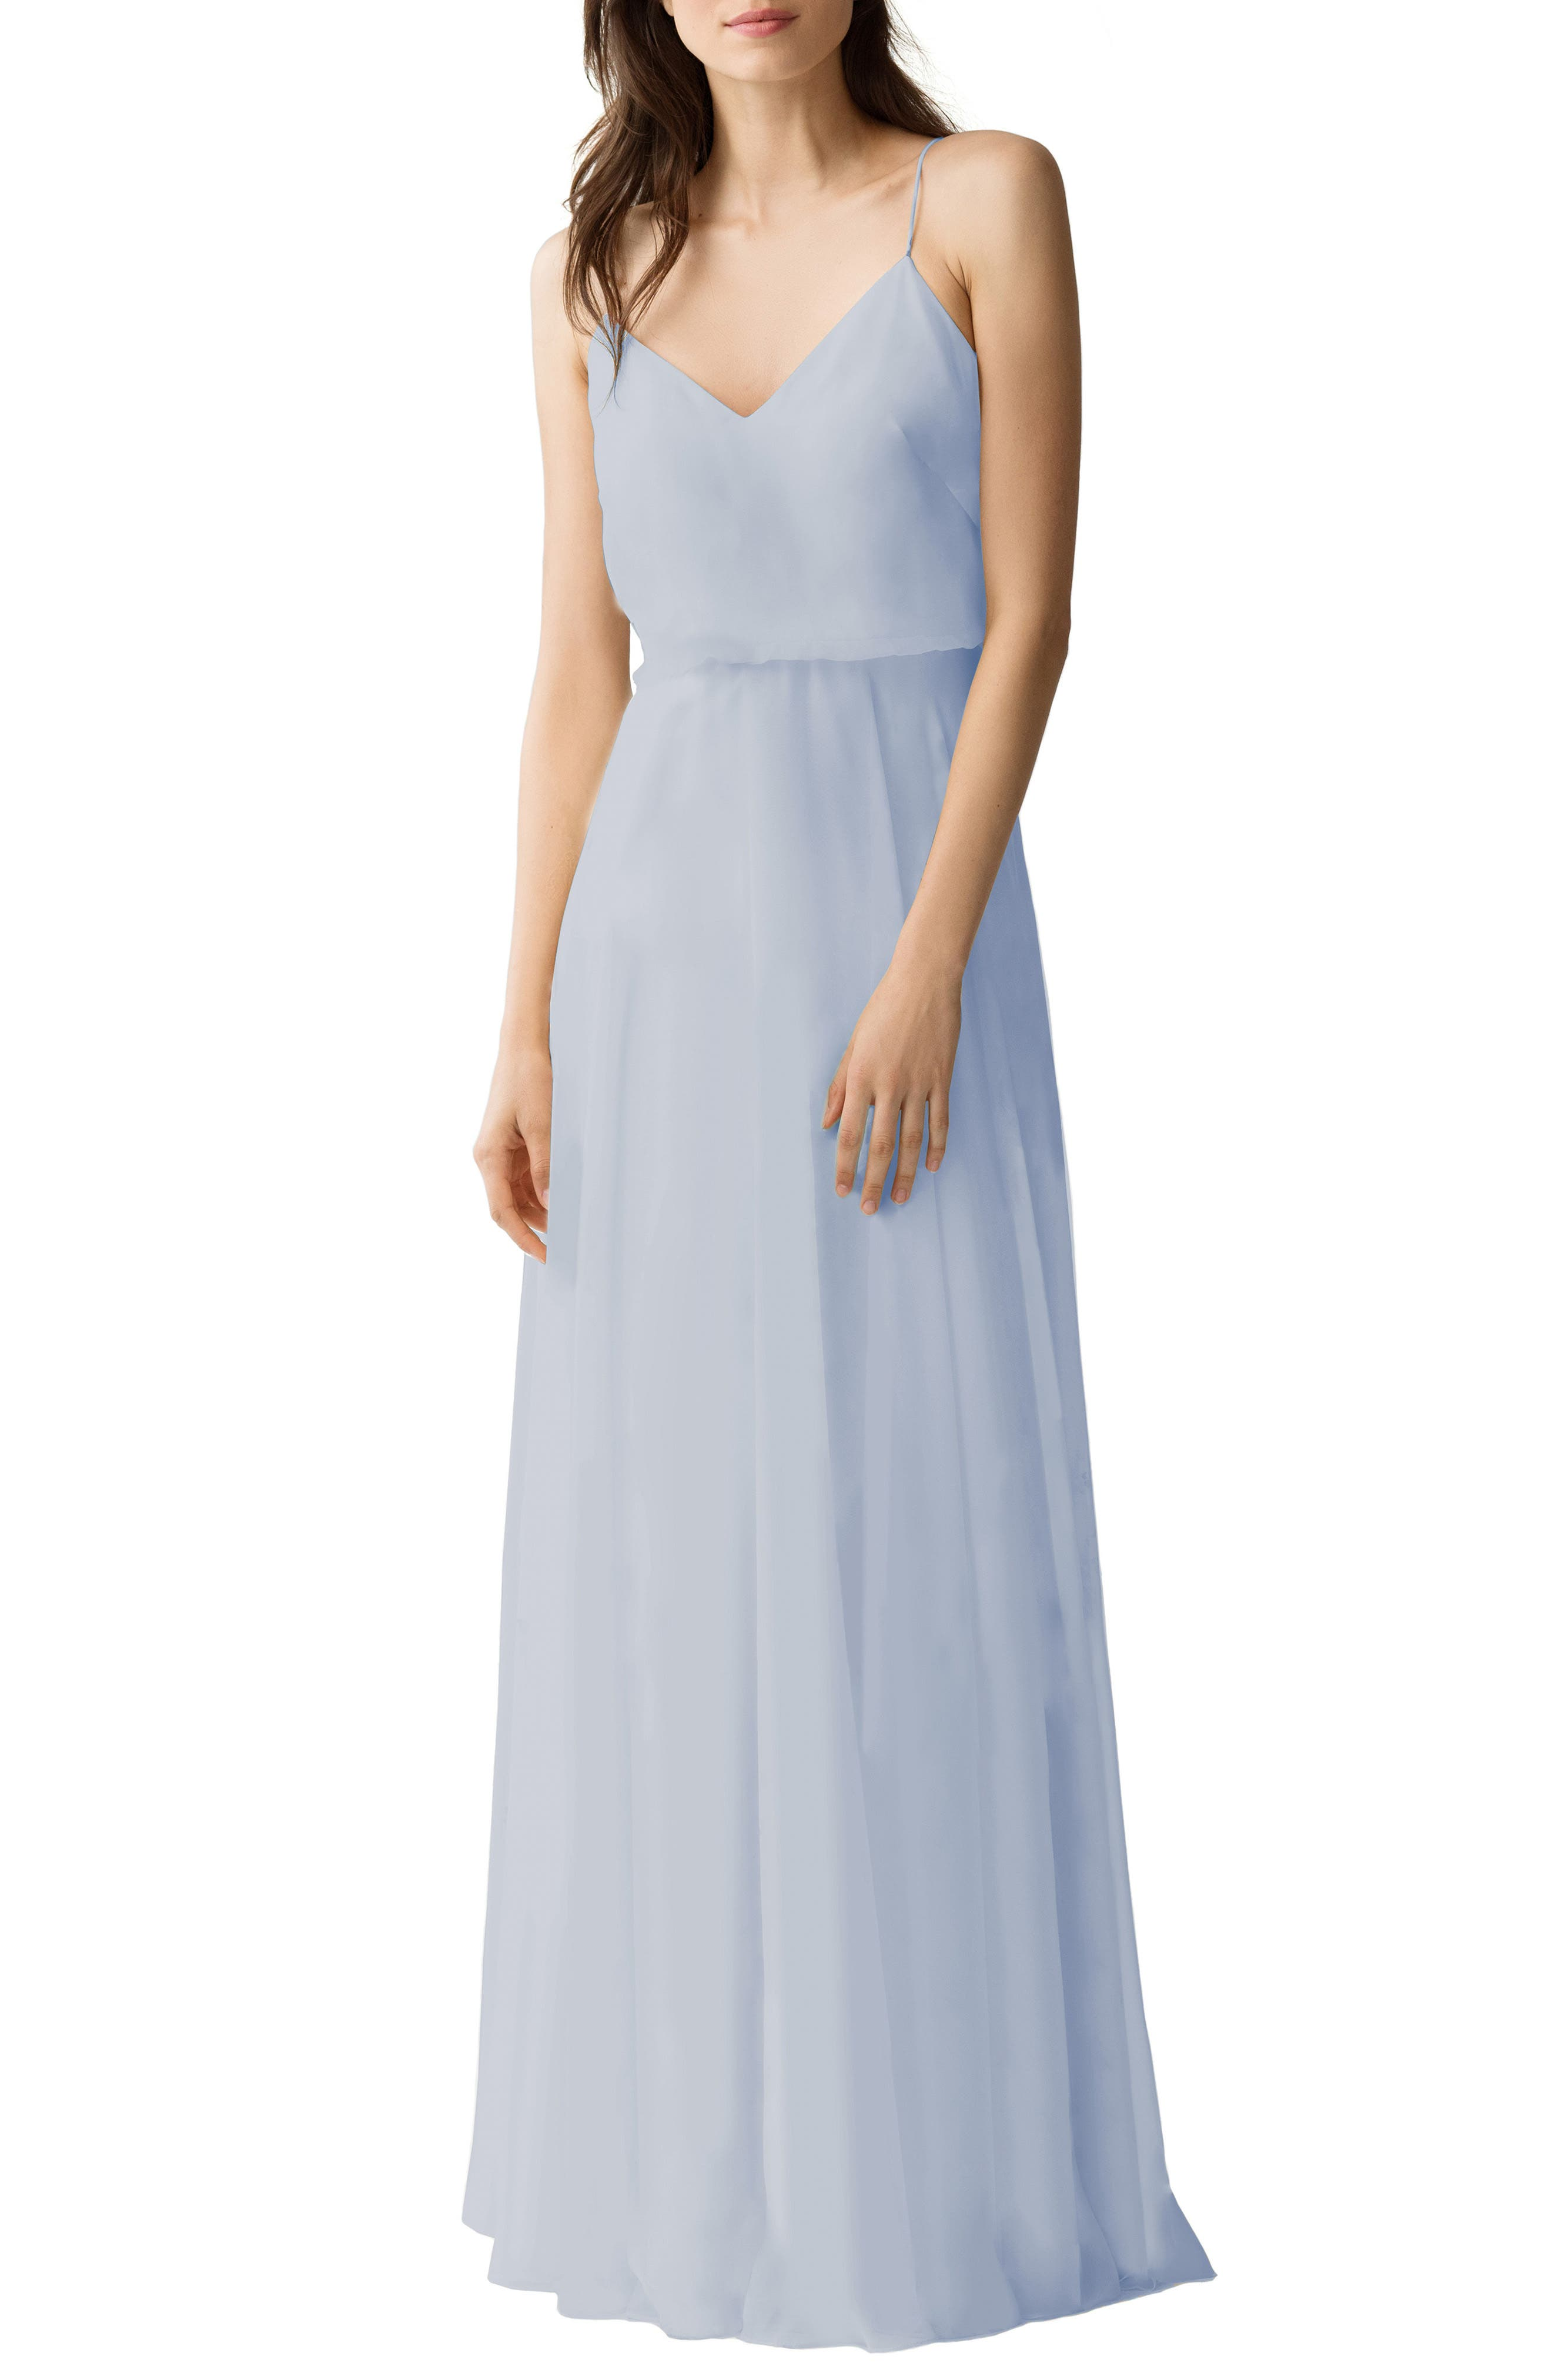 Blue Prom Dresses 2019 Nordstrom